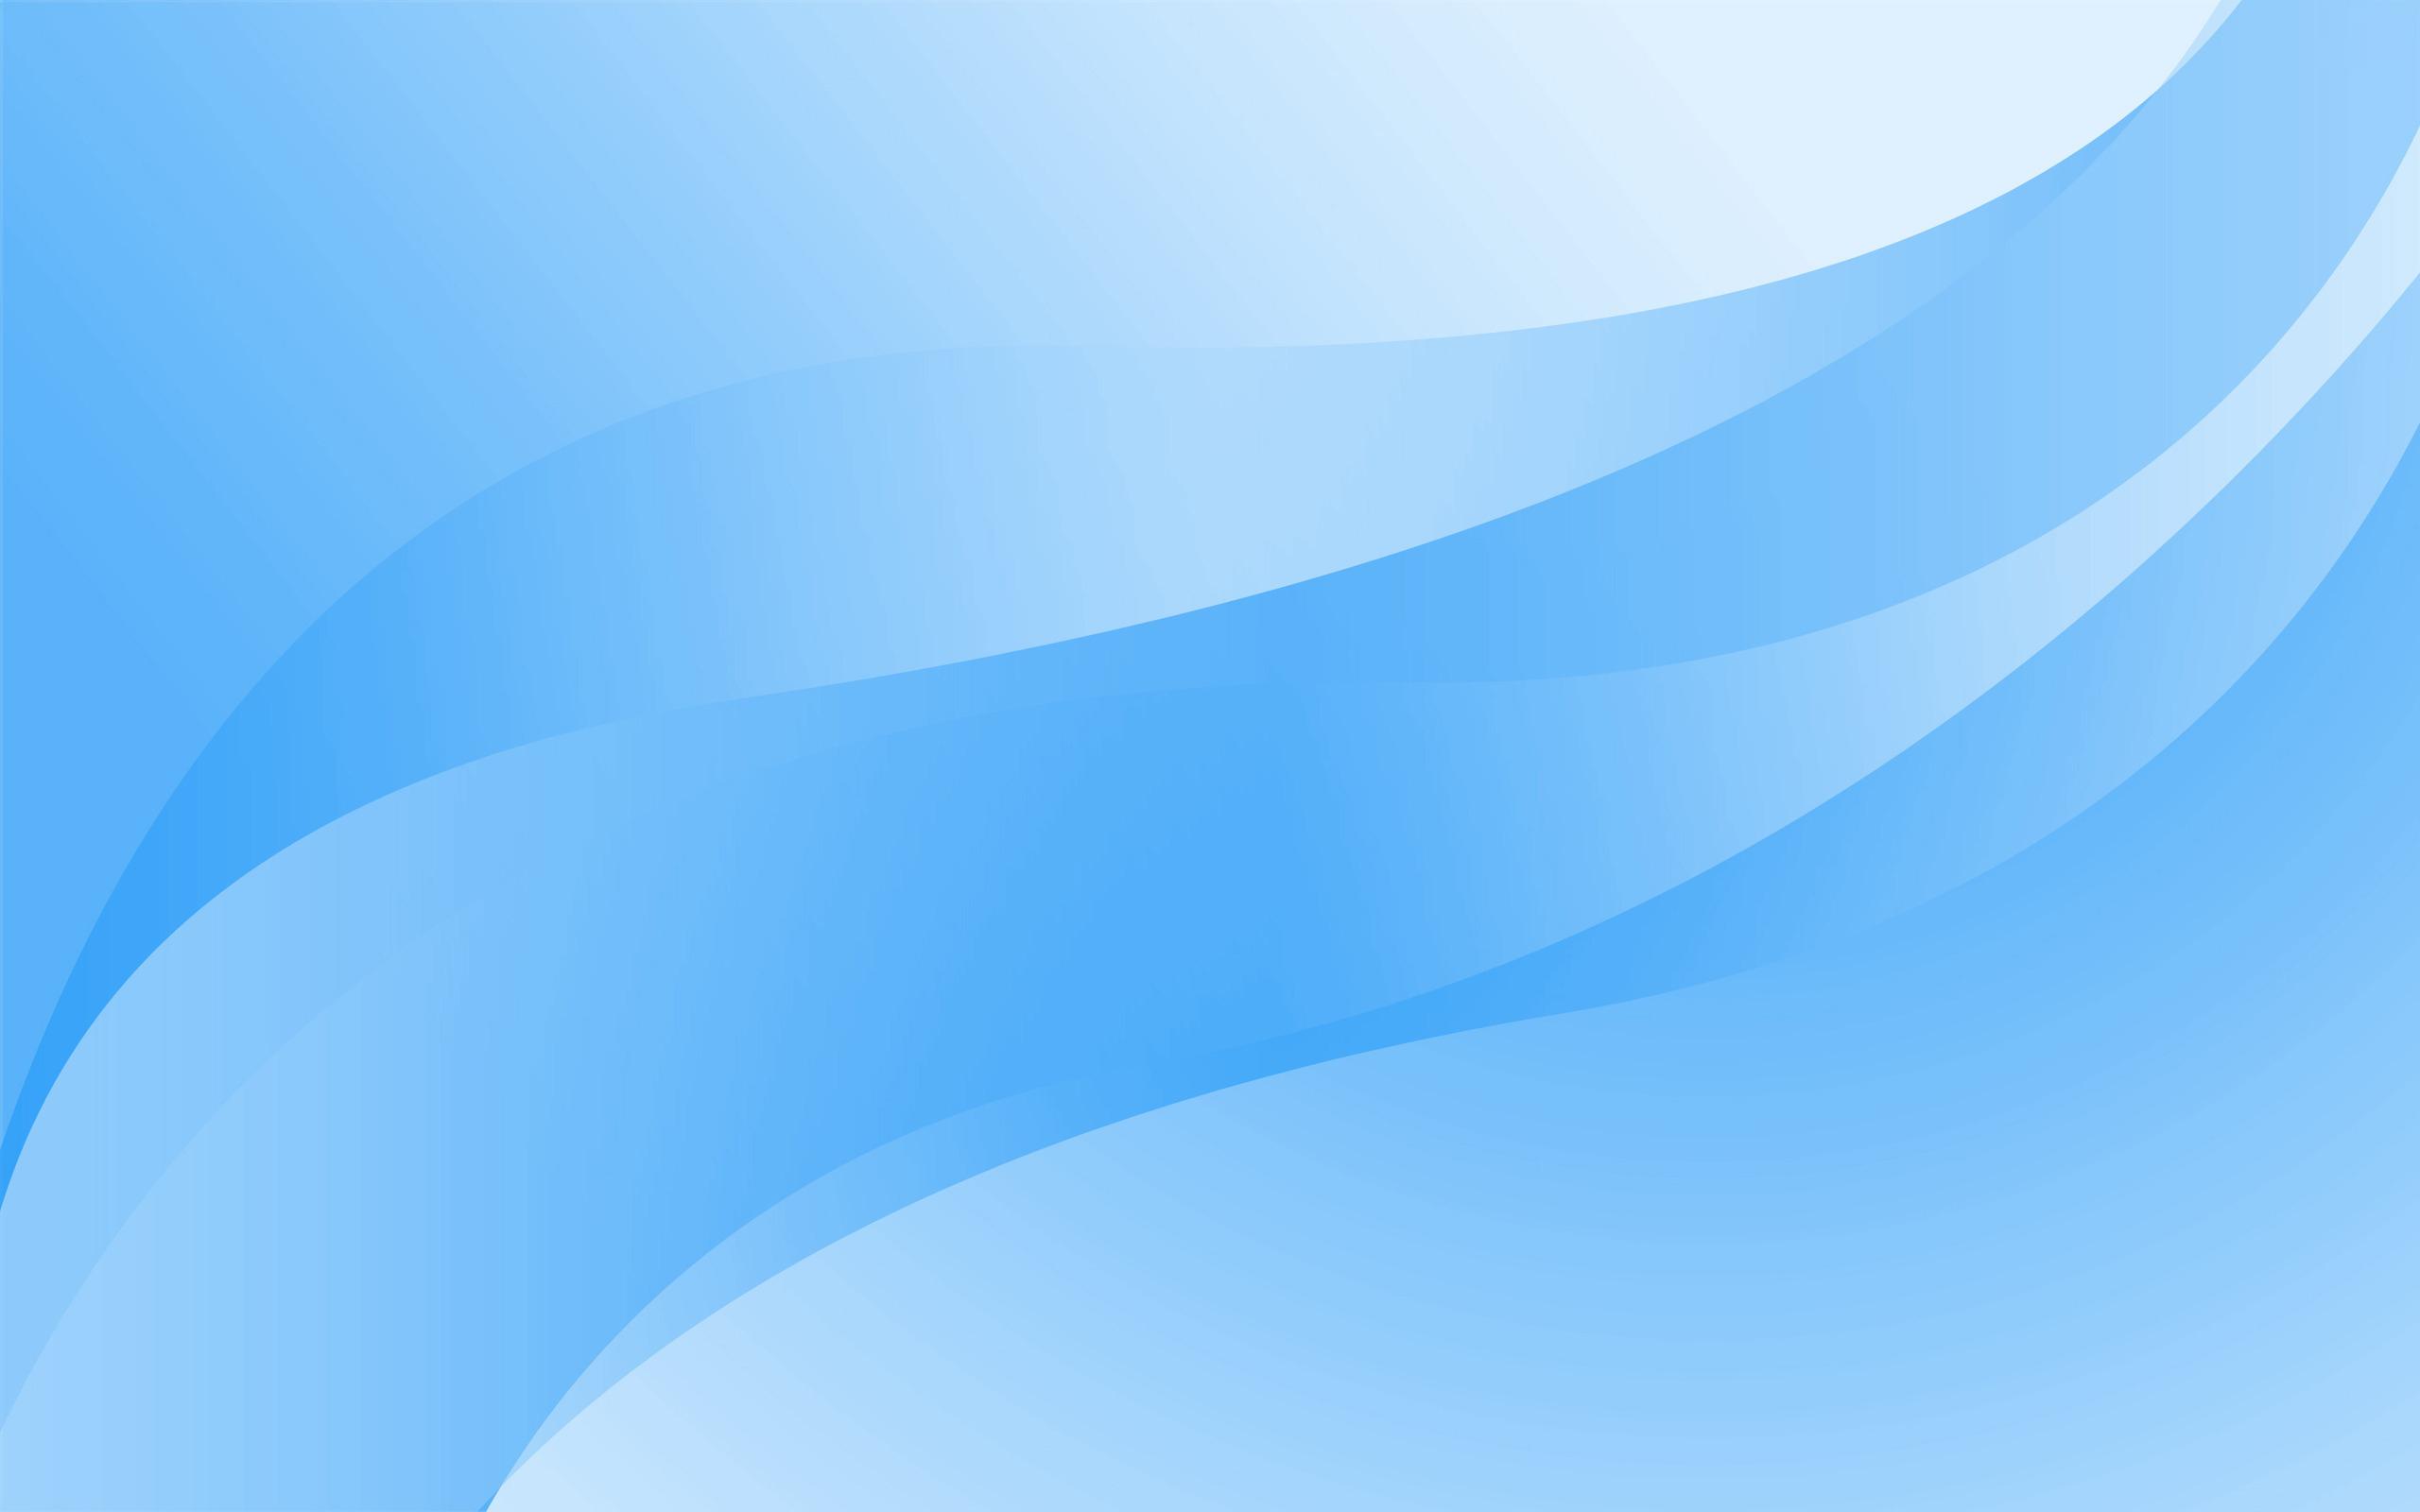 Violet Flower Hd Wallpaper Light Blue Hd Backgrounds Pixelstalk Net